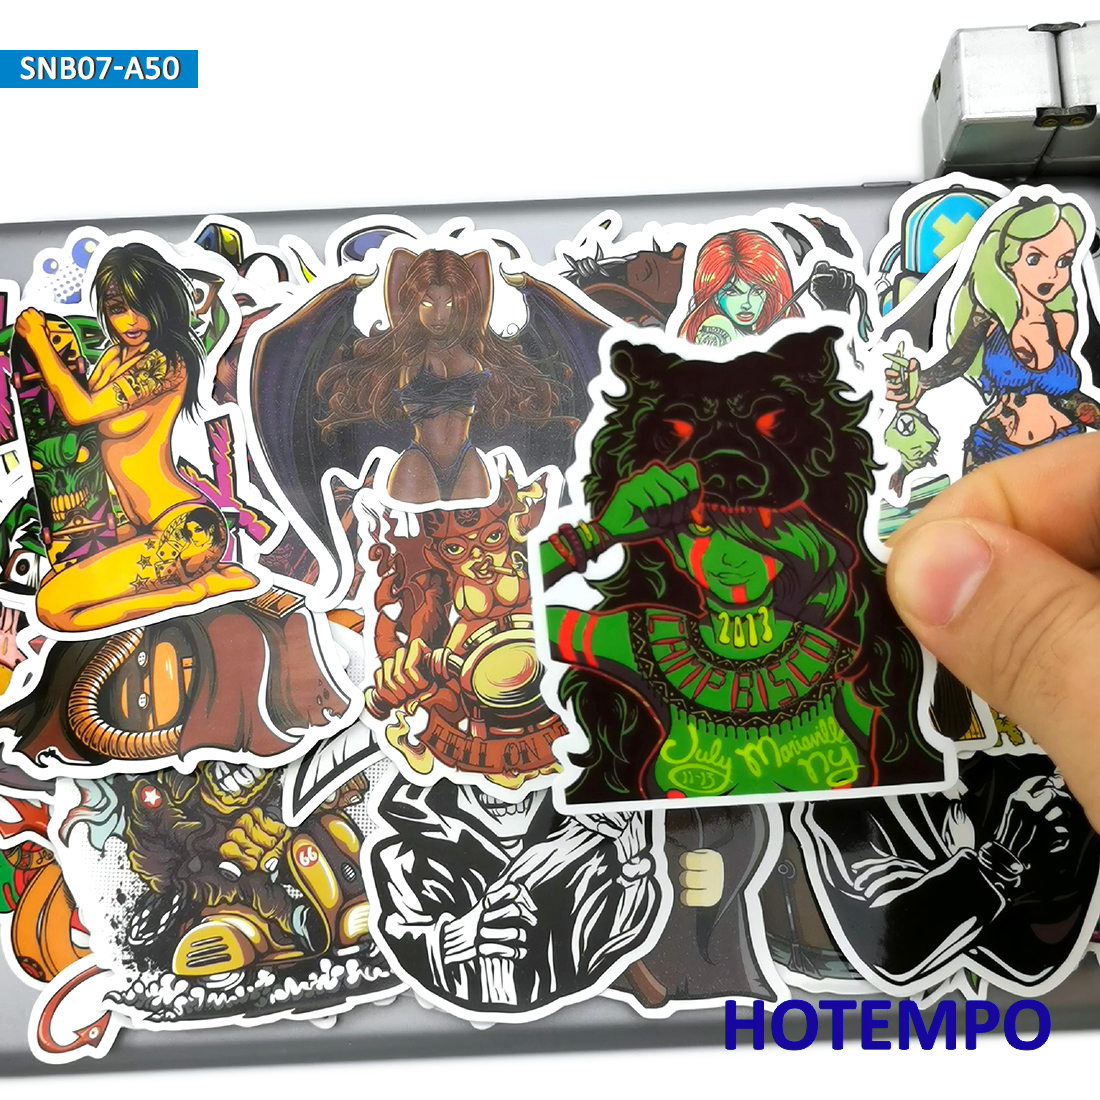 50pcs Punk Rock Graffiti Mix Weird Funny Fashion Stickers For Mobile Phone Laptop Luggage Skateboard Bike Car Art Style Stickers